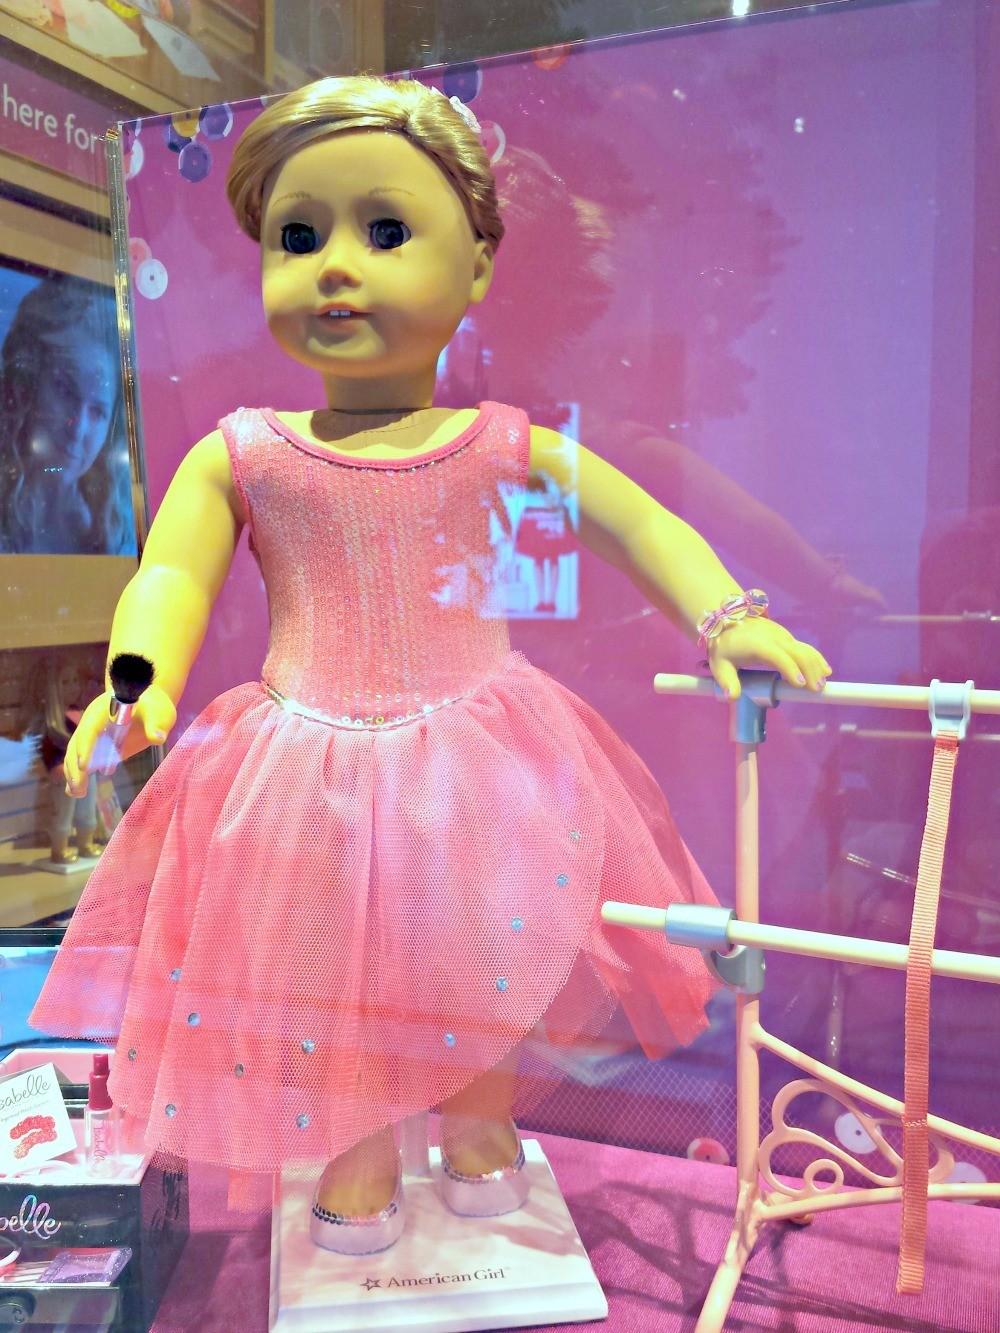 American Girl Doll Store | Skimbaco Lifestyle | online magazine